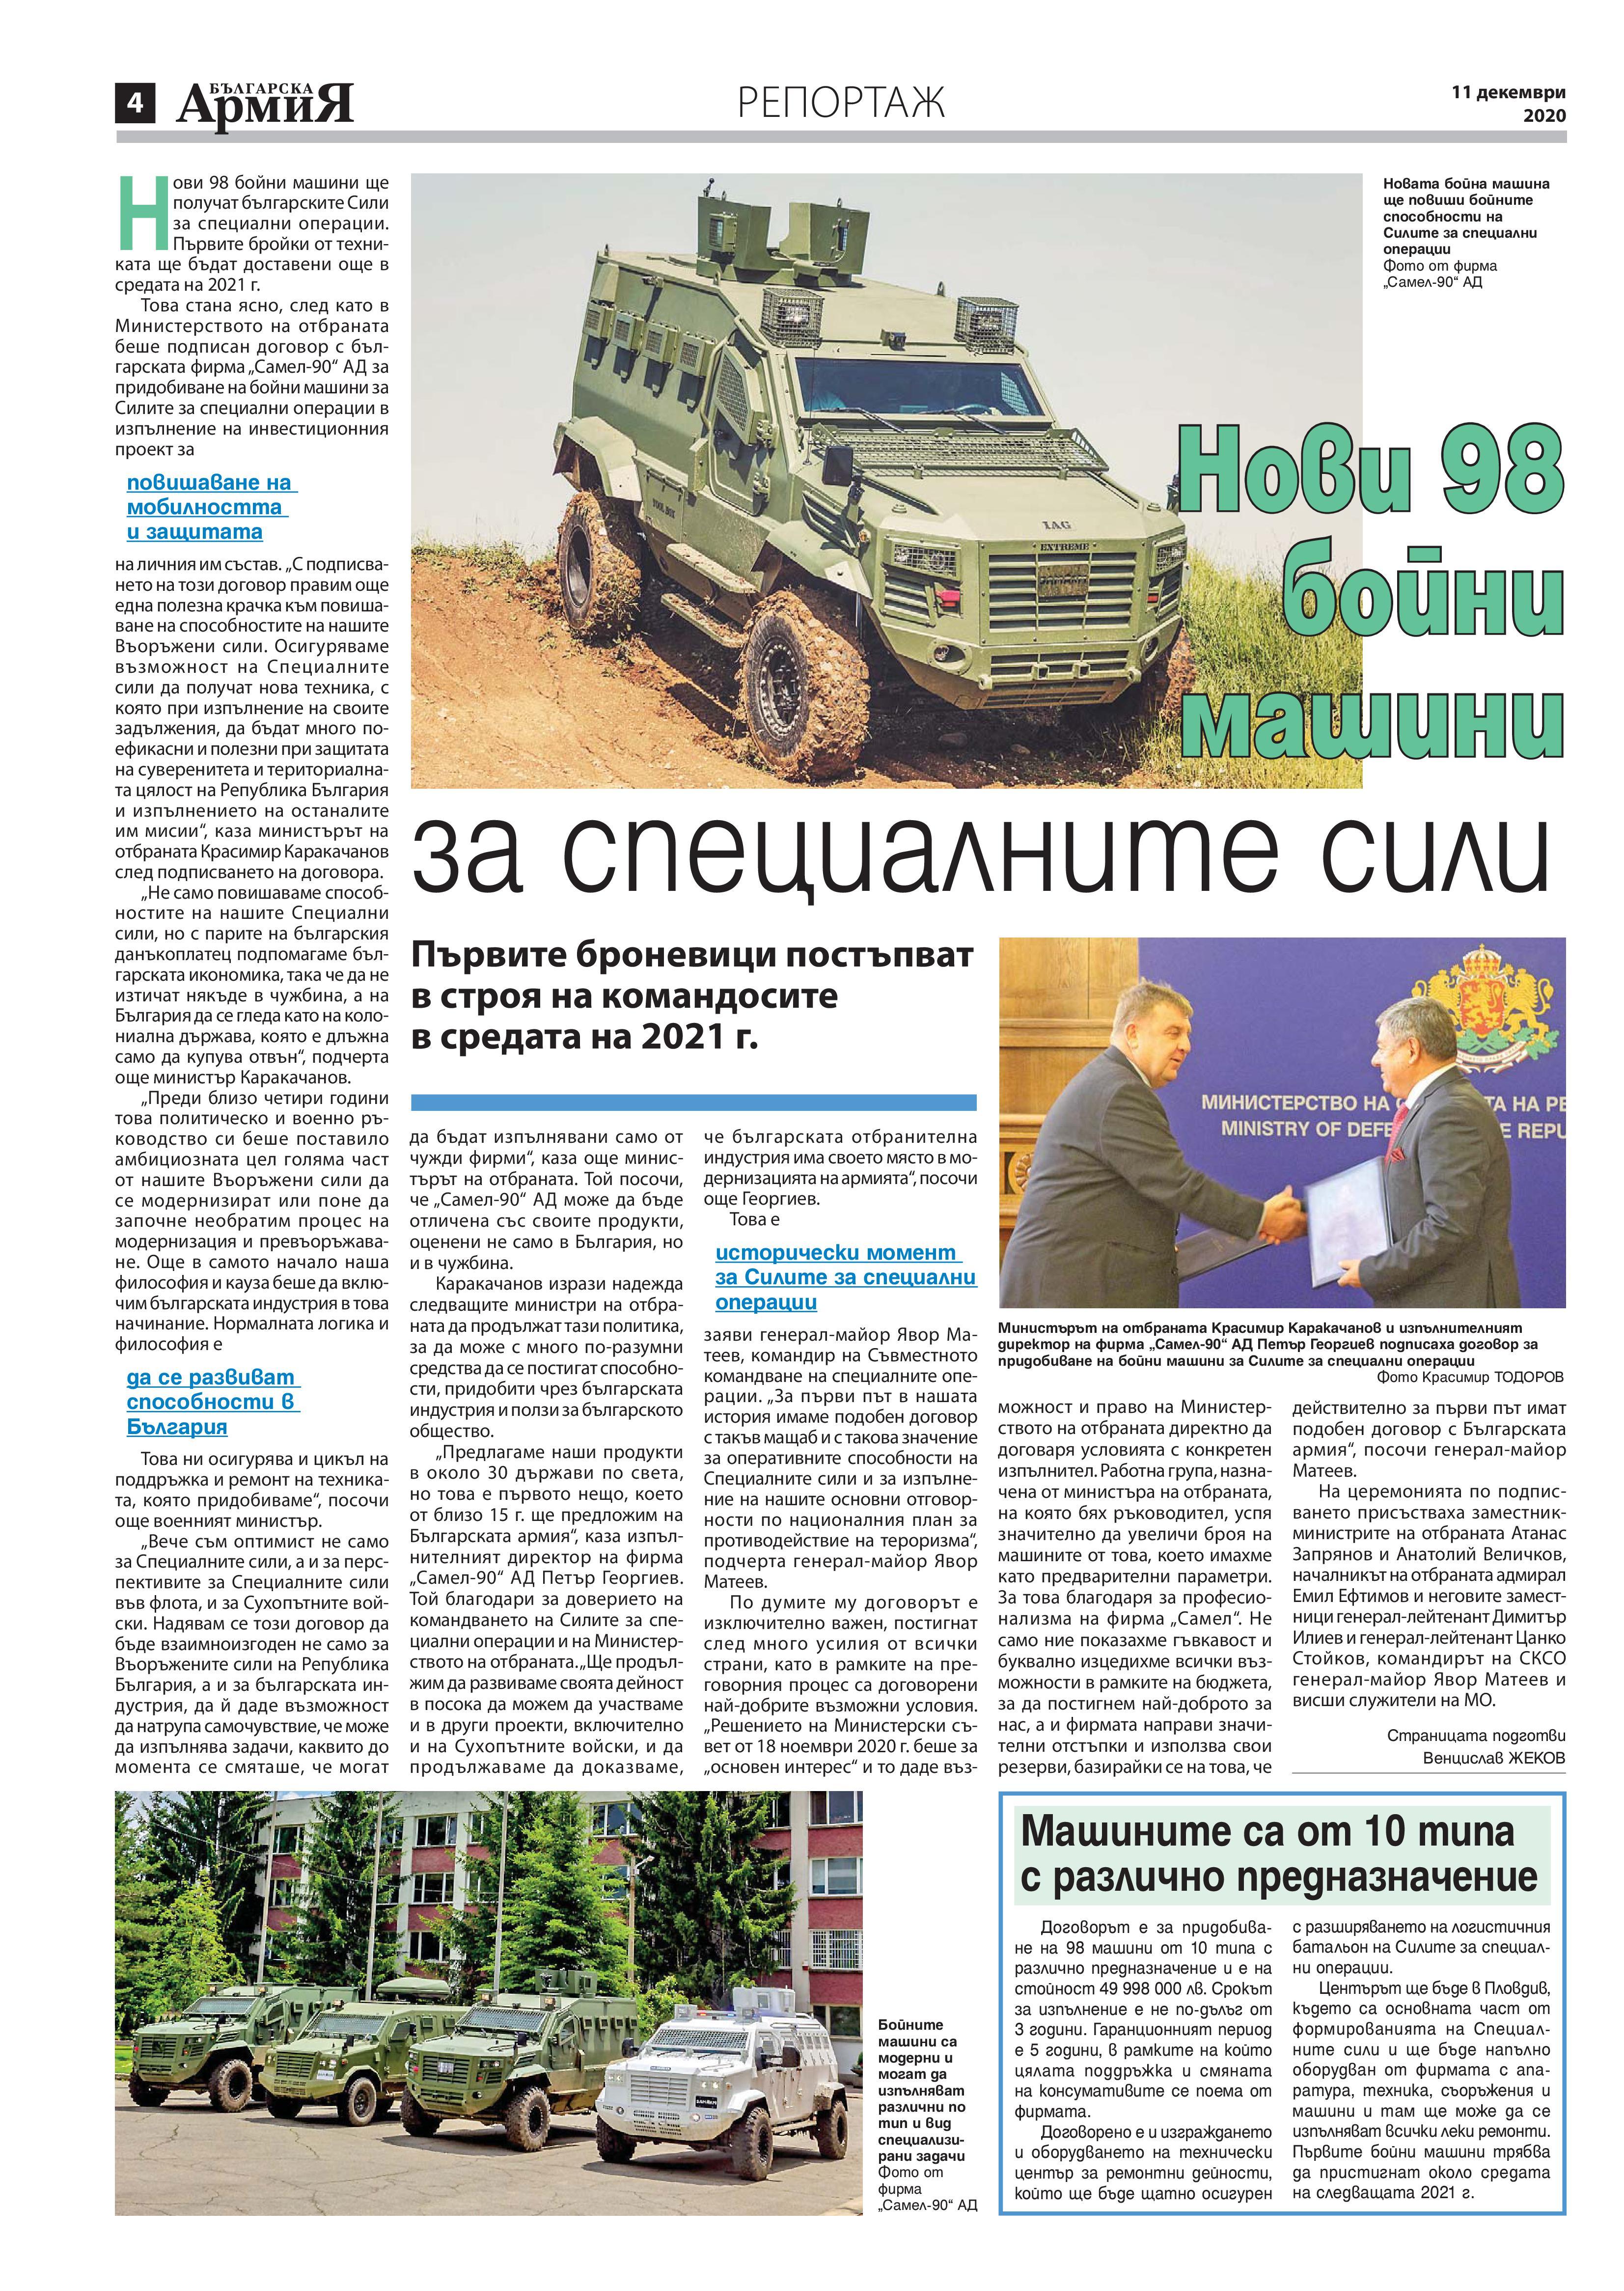 https://www.armymedia.bg/wp-content/uploads/2015/06/04-51.jpg